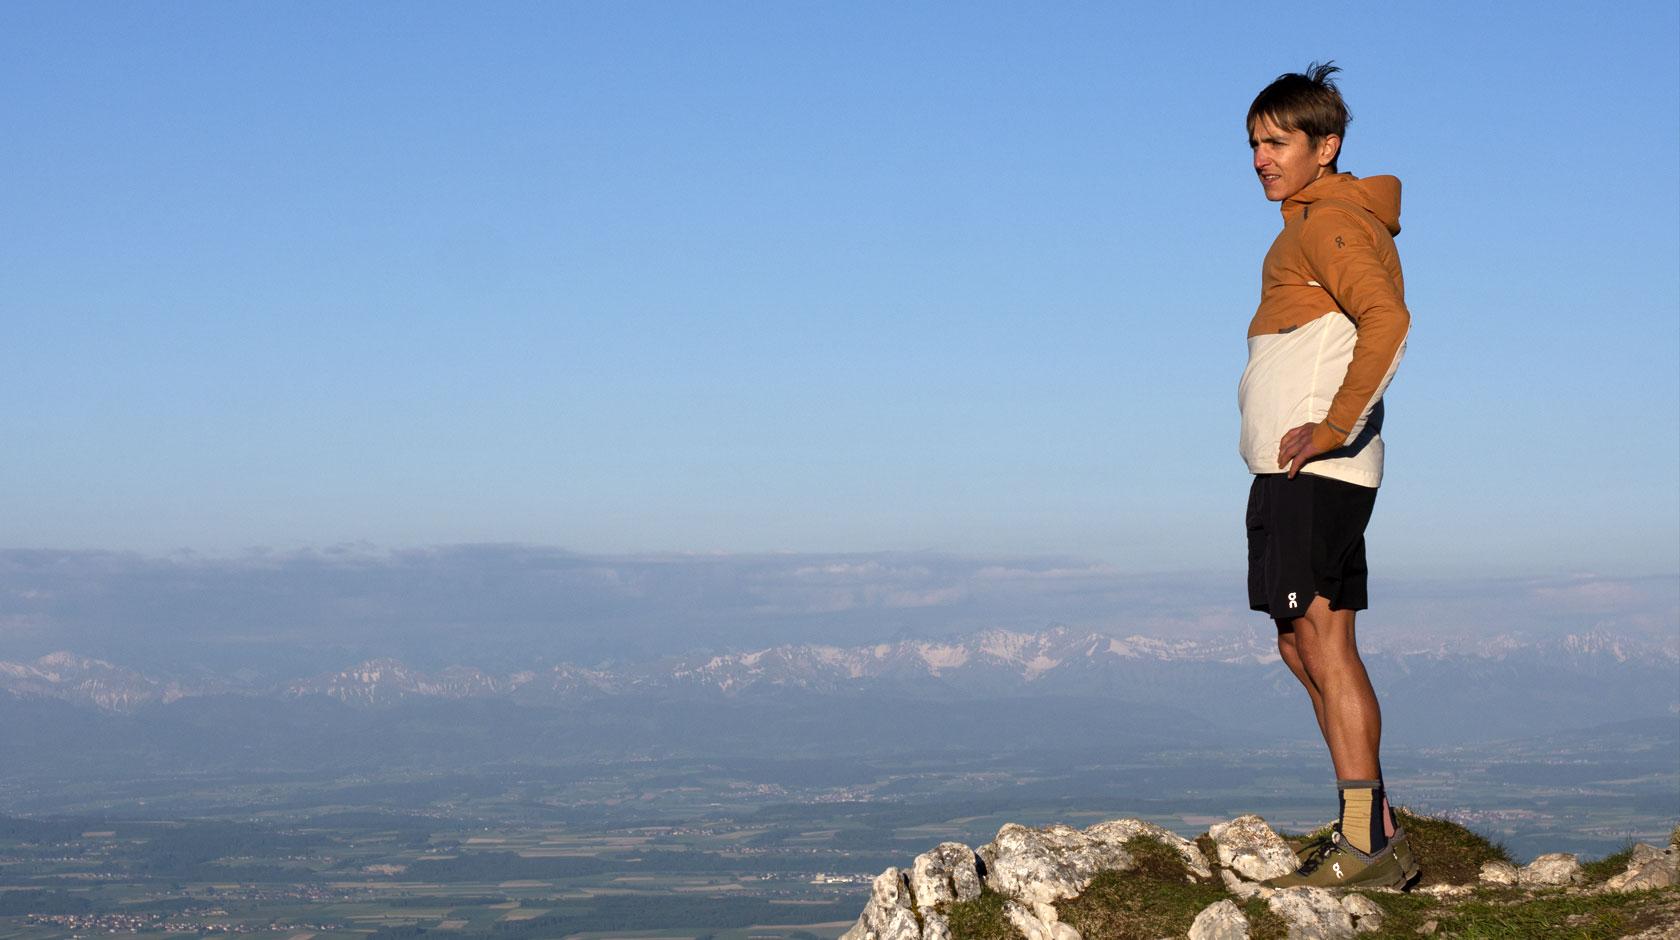 Xavier on the mountain